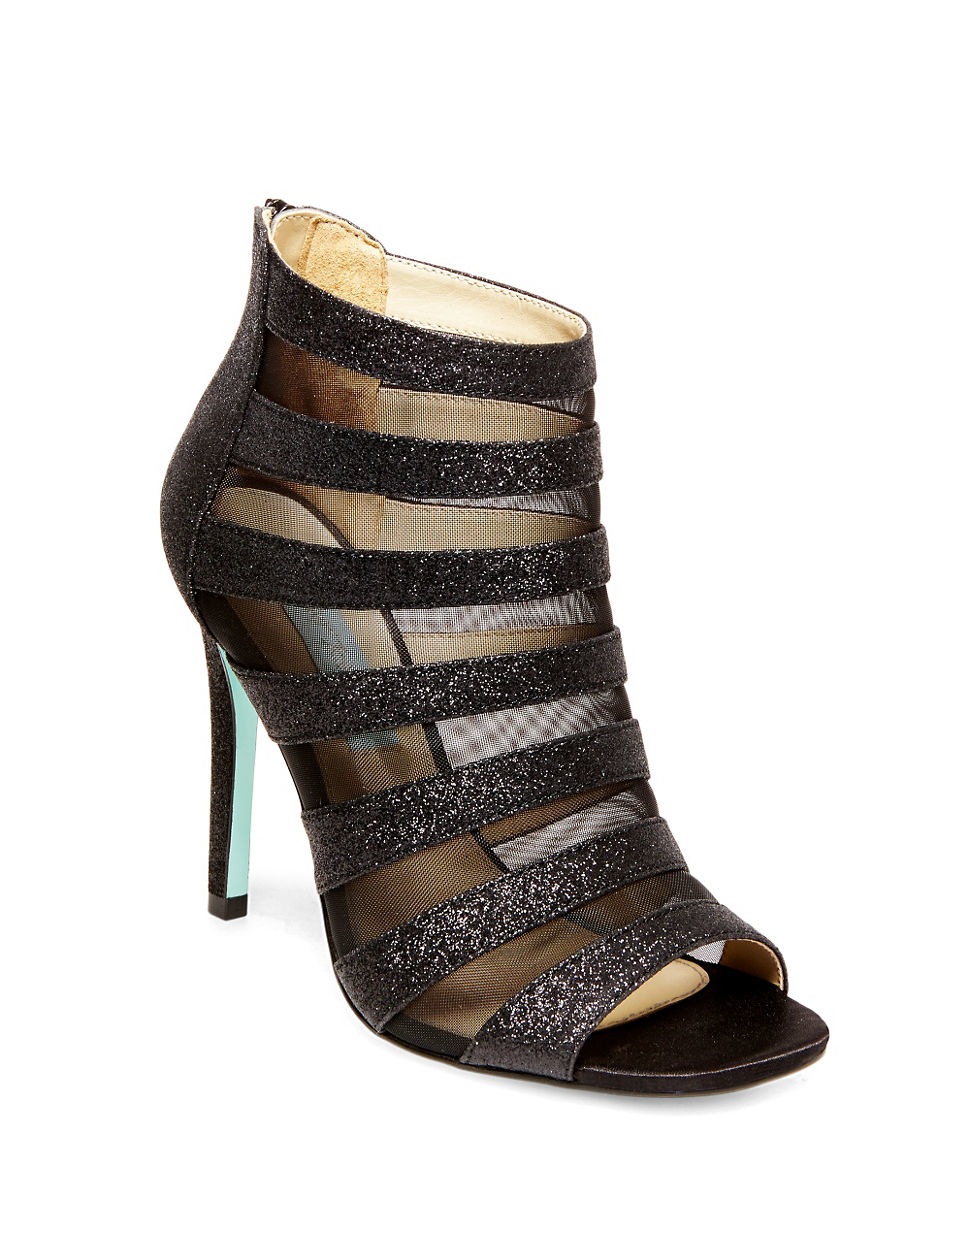 Betsey Johnson Shoes Black